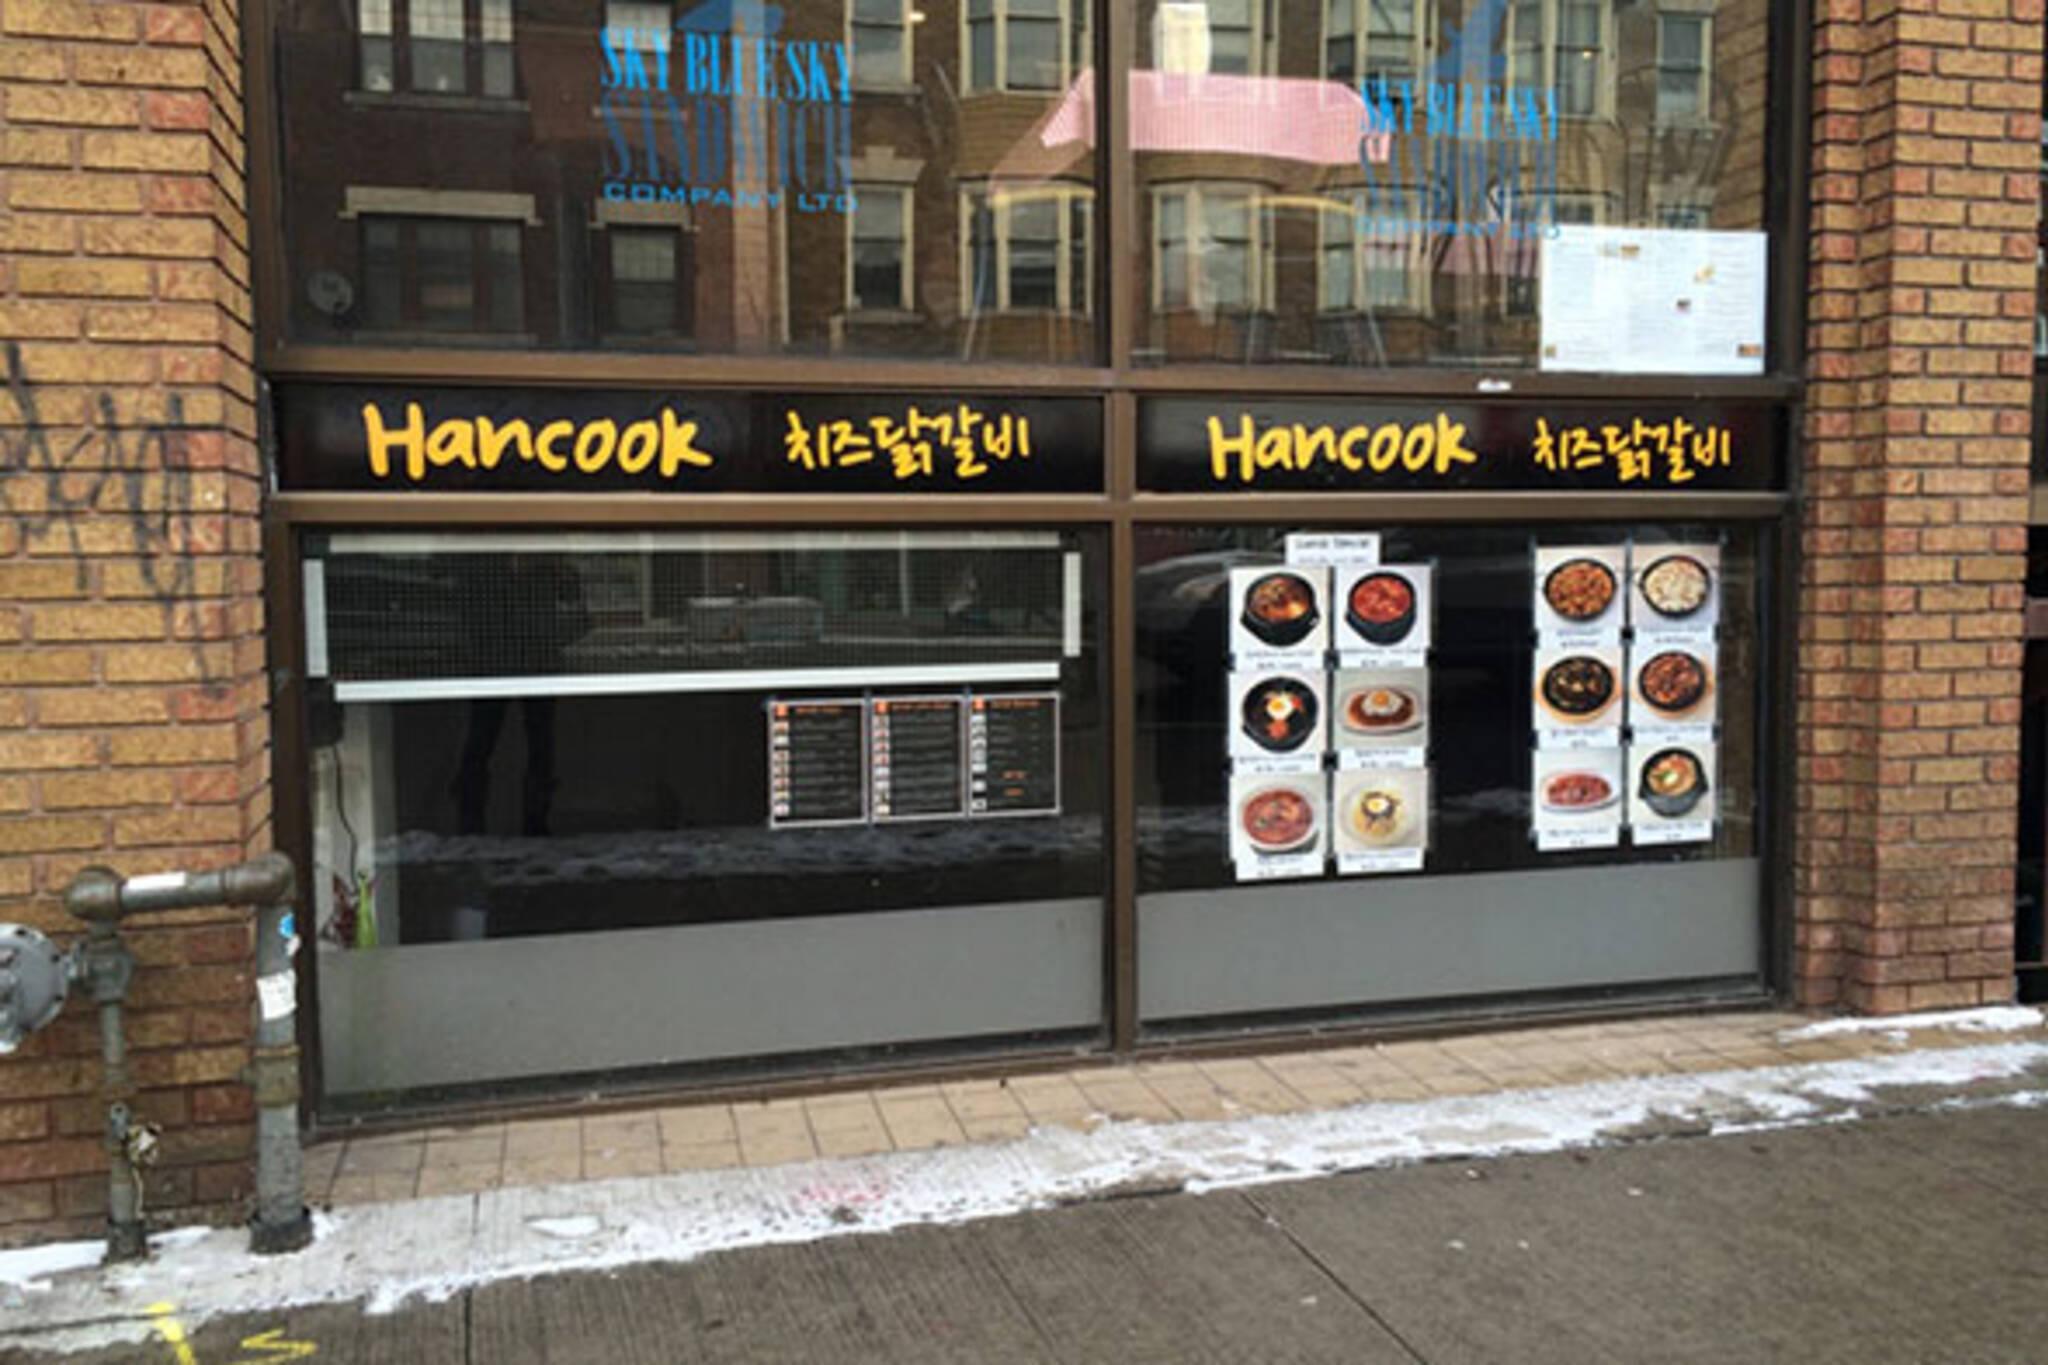 Hancook